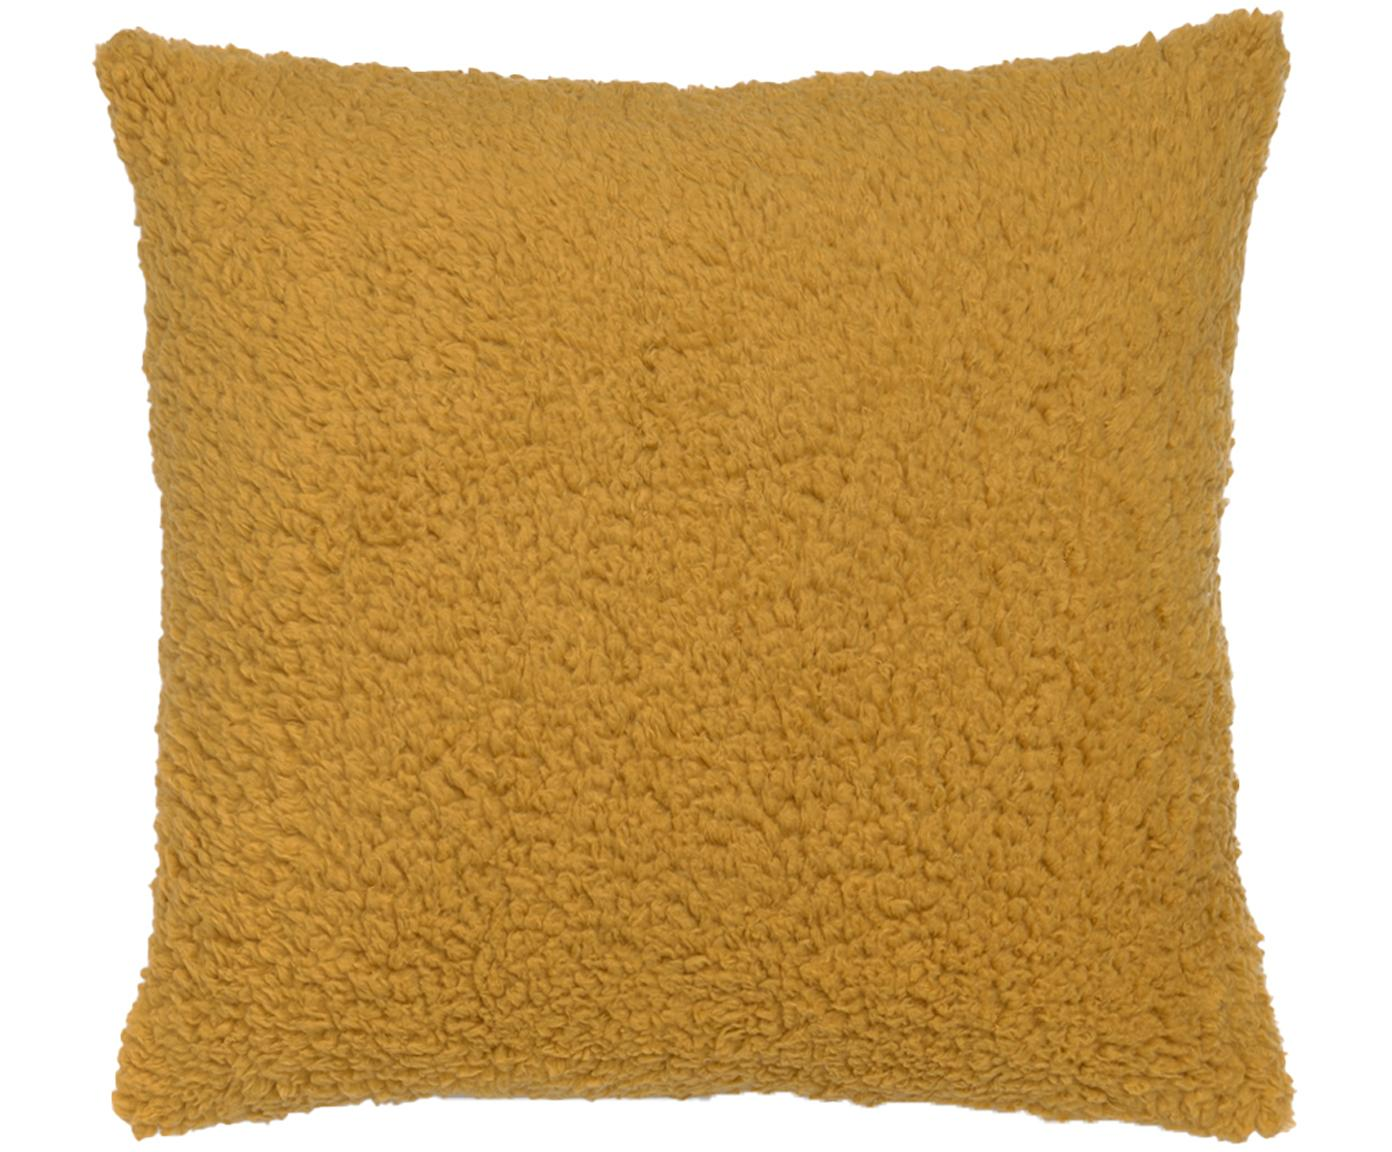 Federa arredo in Teddy in giallo senape Ted, Poliestere, Giallo senape, Larg. 45 x Lung. 45 cm